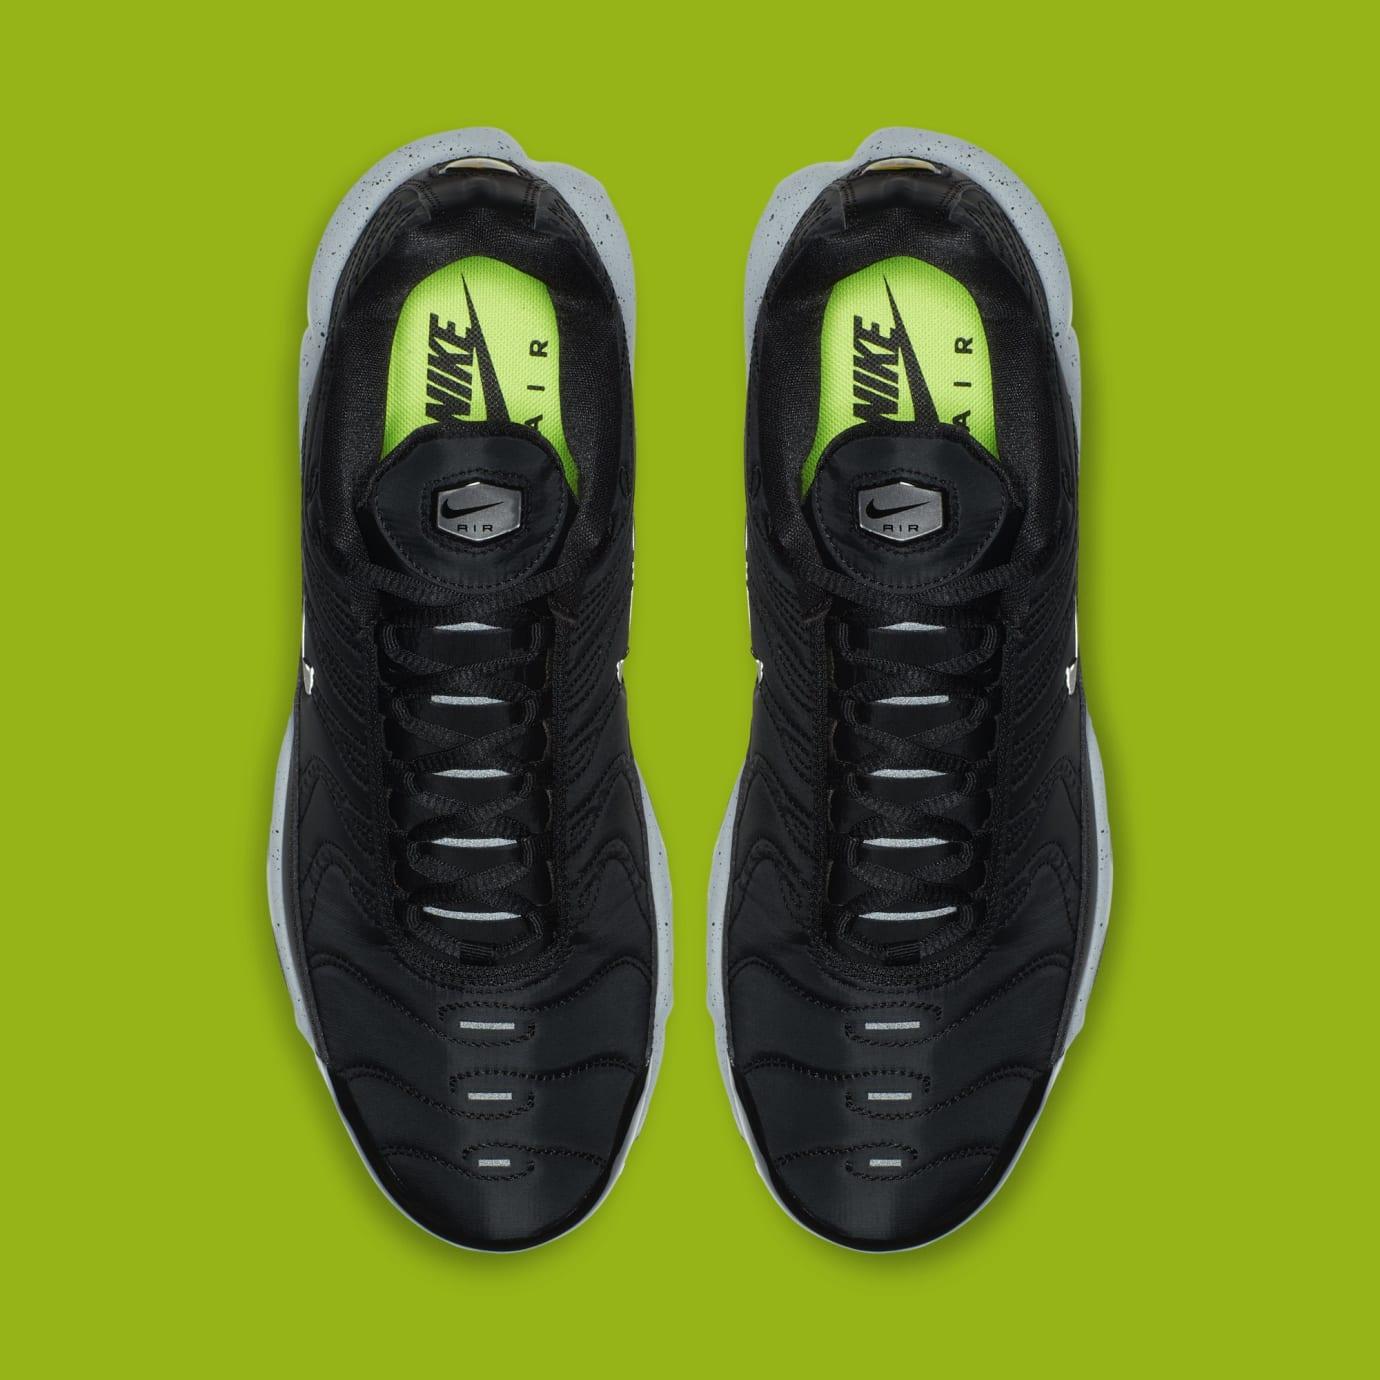 Nike Air Max Plus 'Black/Matte Silver/Volt' 815994-003 (Top)